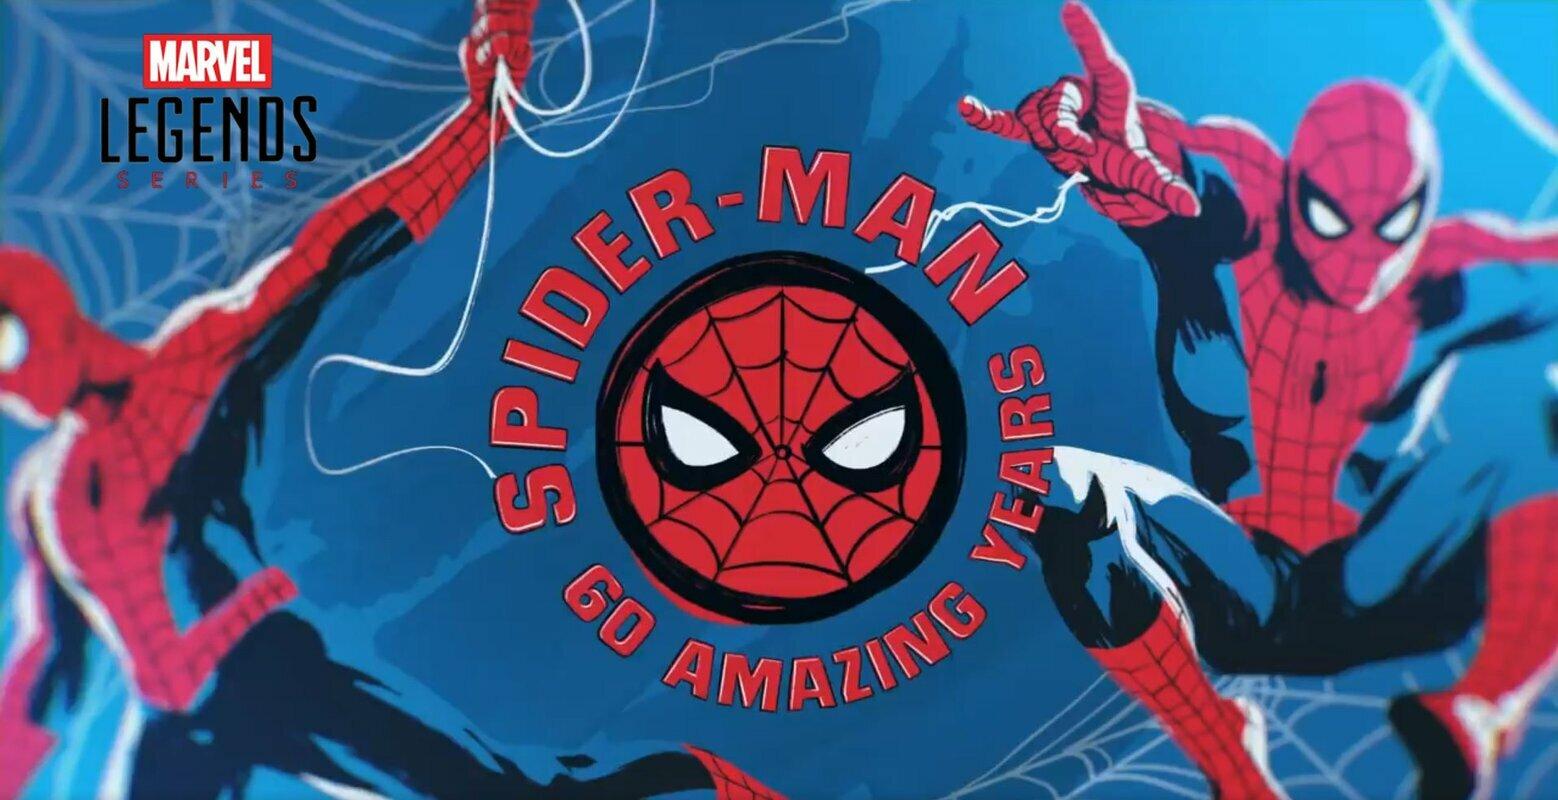 Spider-Man-60th-Anniversary__scaled_800.jpg.dfdb25e57ed67e7f0c2da8fa954b5247.jpg